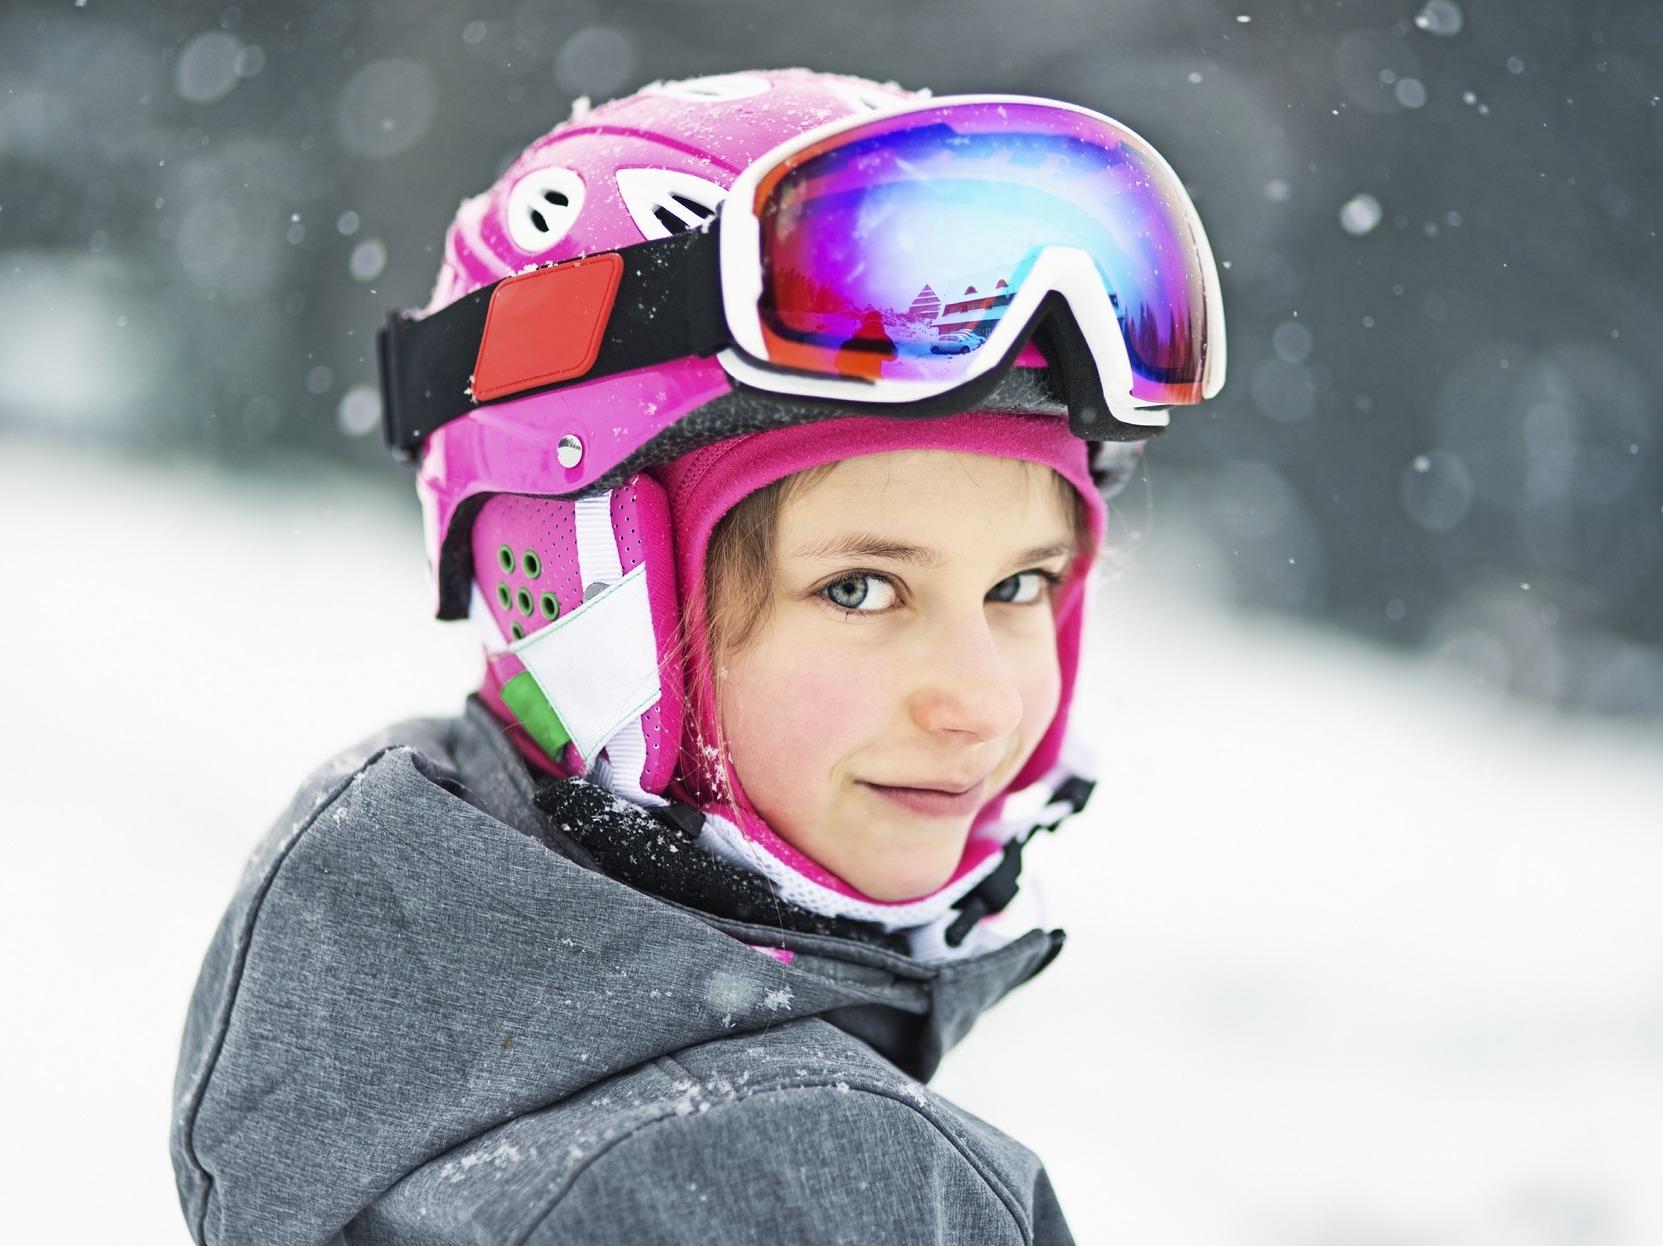 ski, snowboarding, snow, winter fun, kids skiing